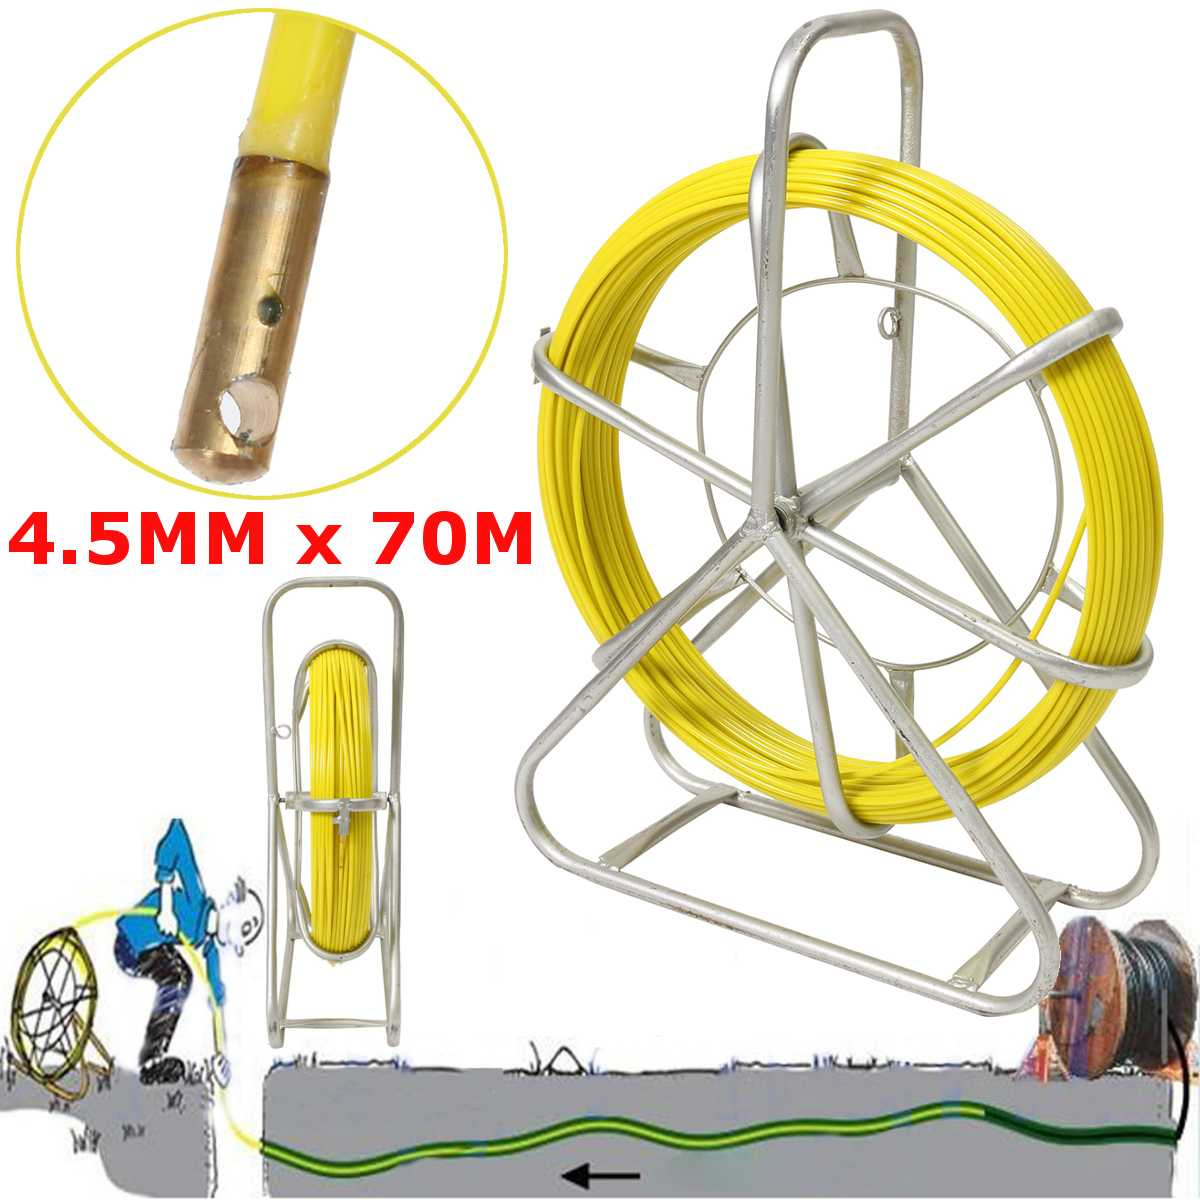 cabo de fio eletrico de 70m 4 5mm haste de corrida roedor extrator de fita de